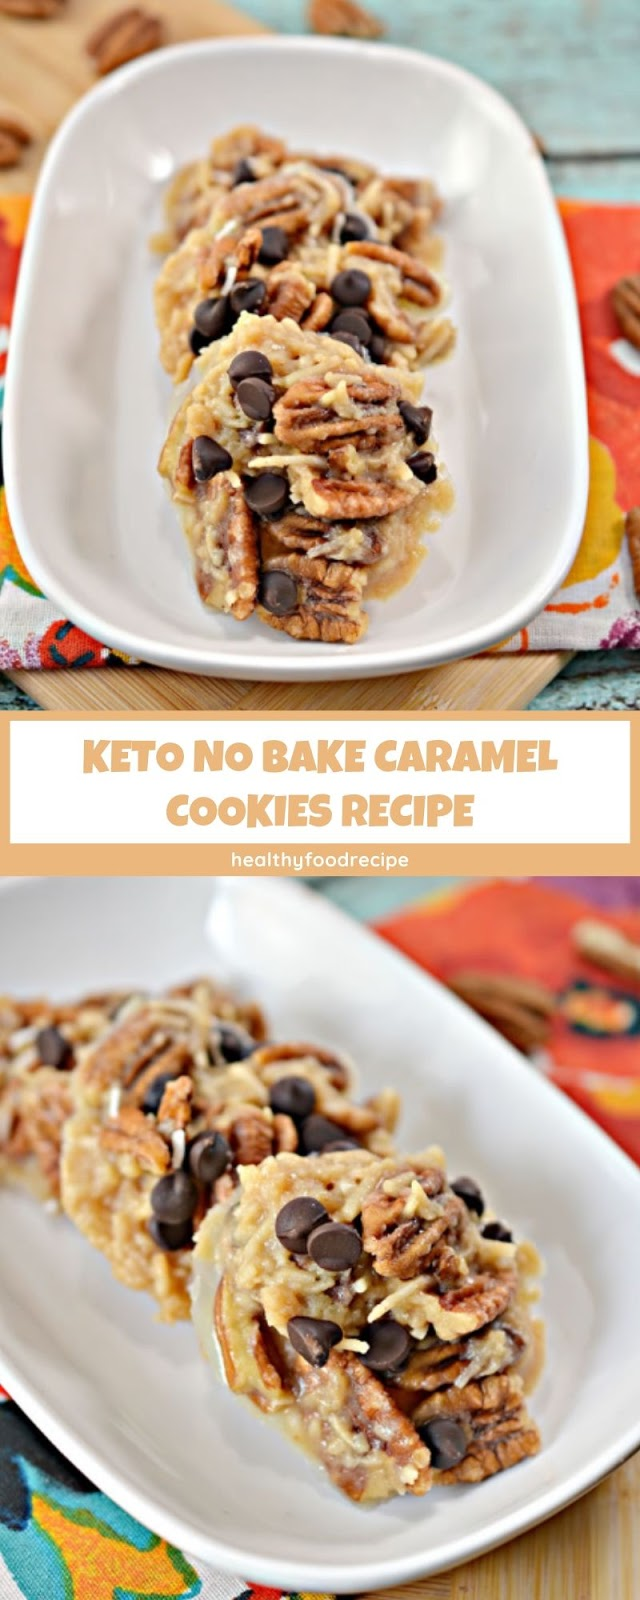 KETO NO BAKE CARAMEL COOKIES RECIPE